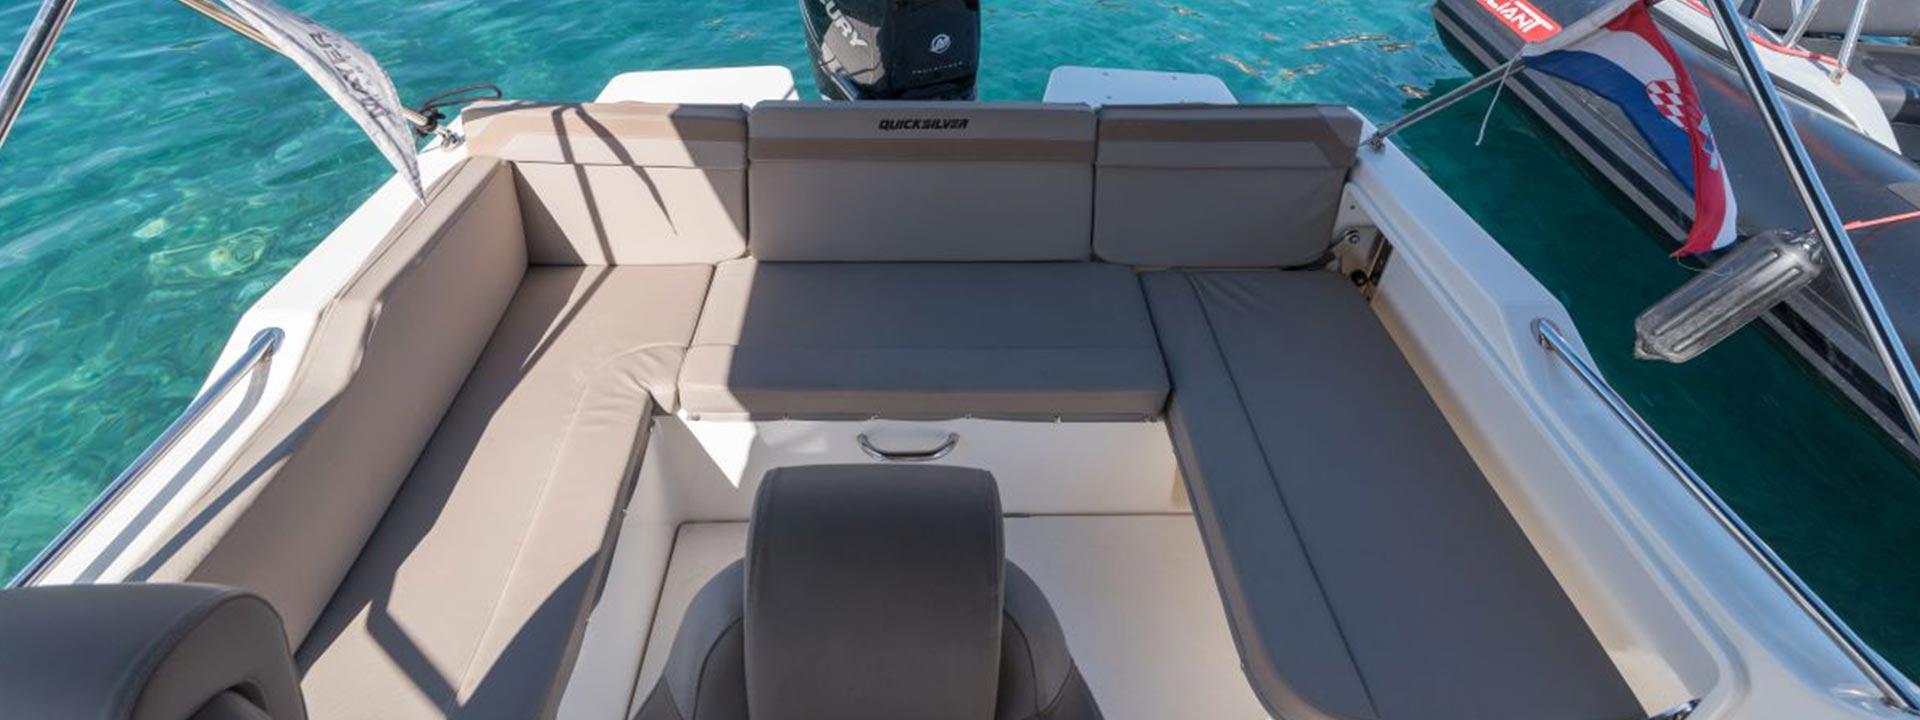 mayer-charter-boat-header-quicksilver-activ-755-sundeck-05